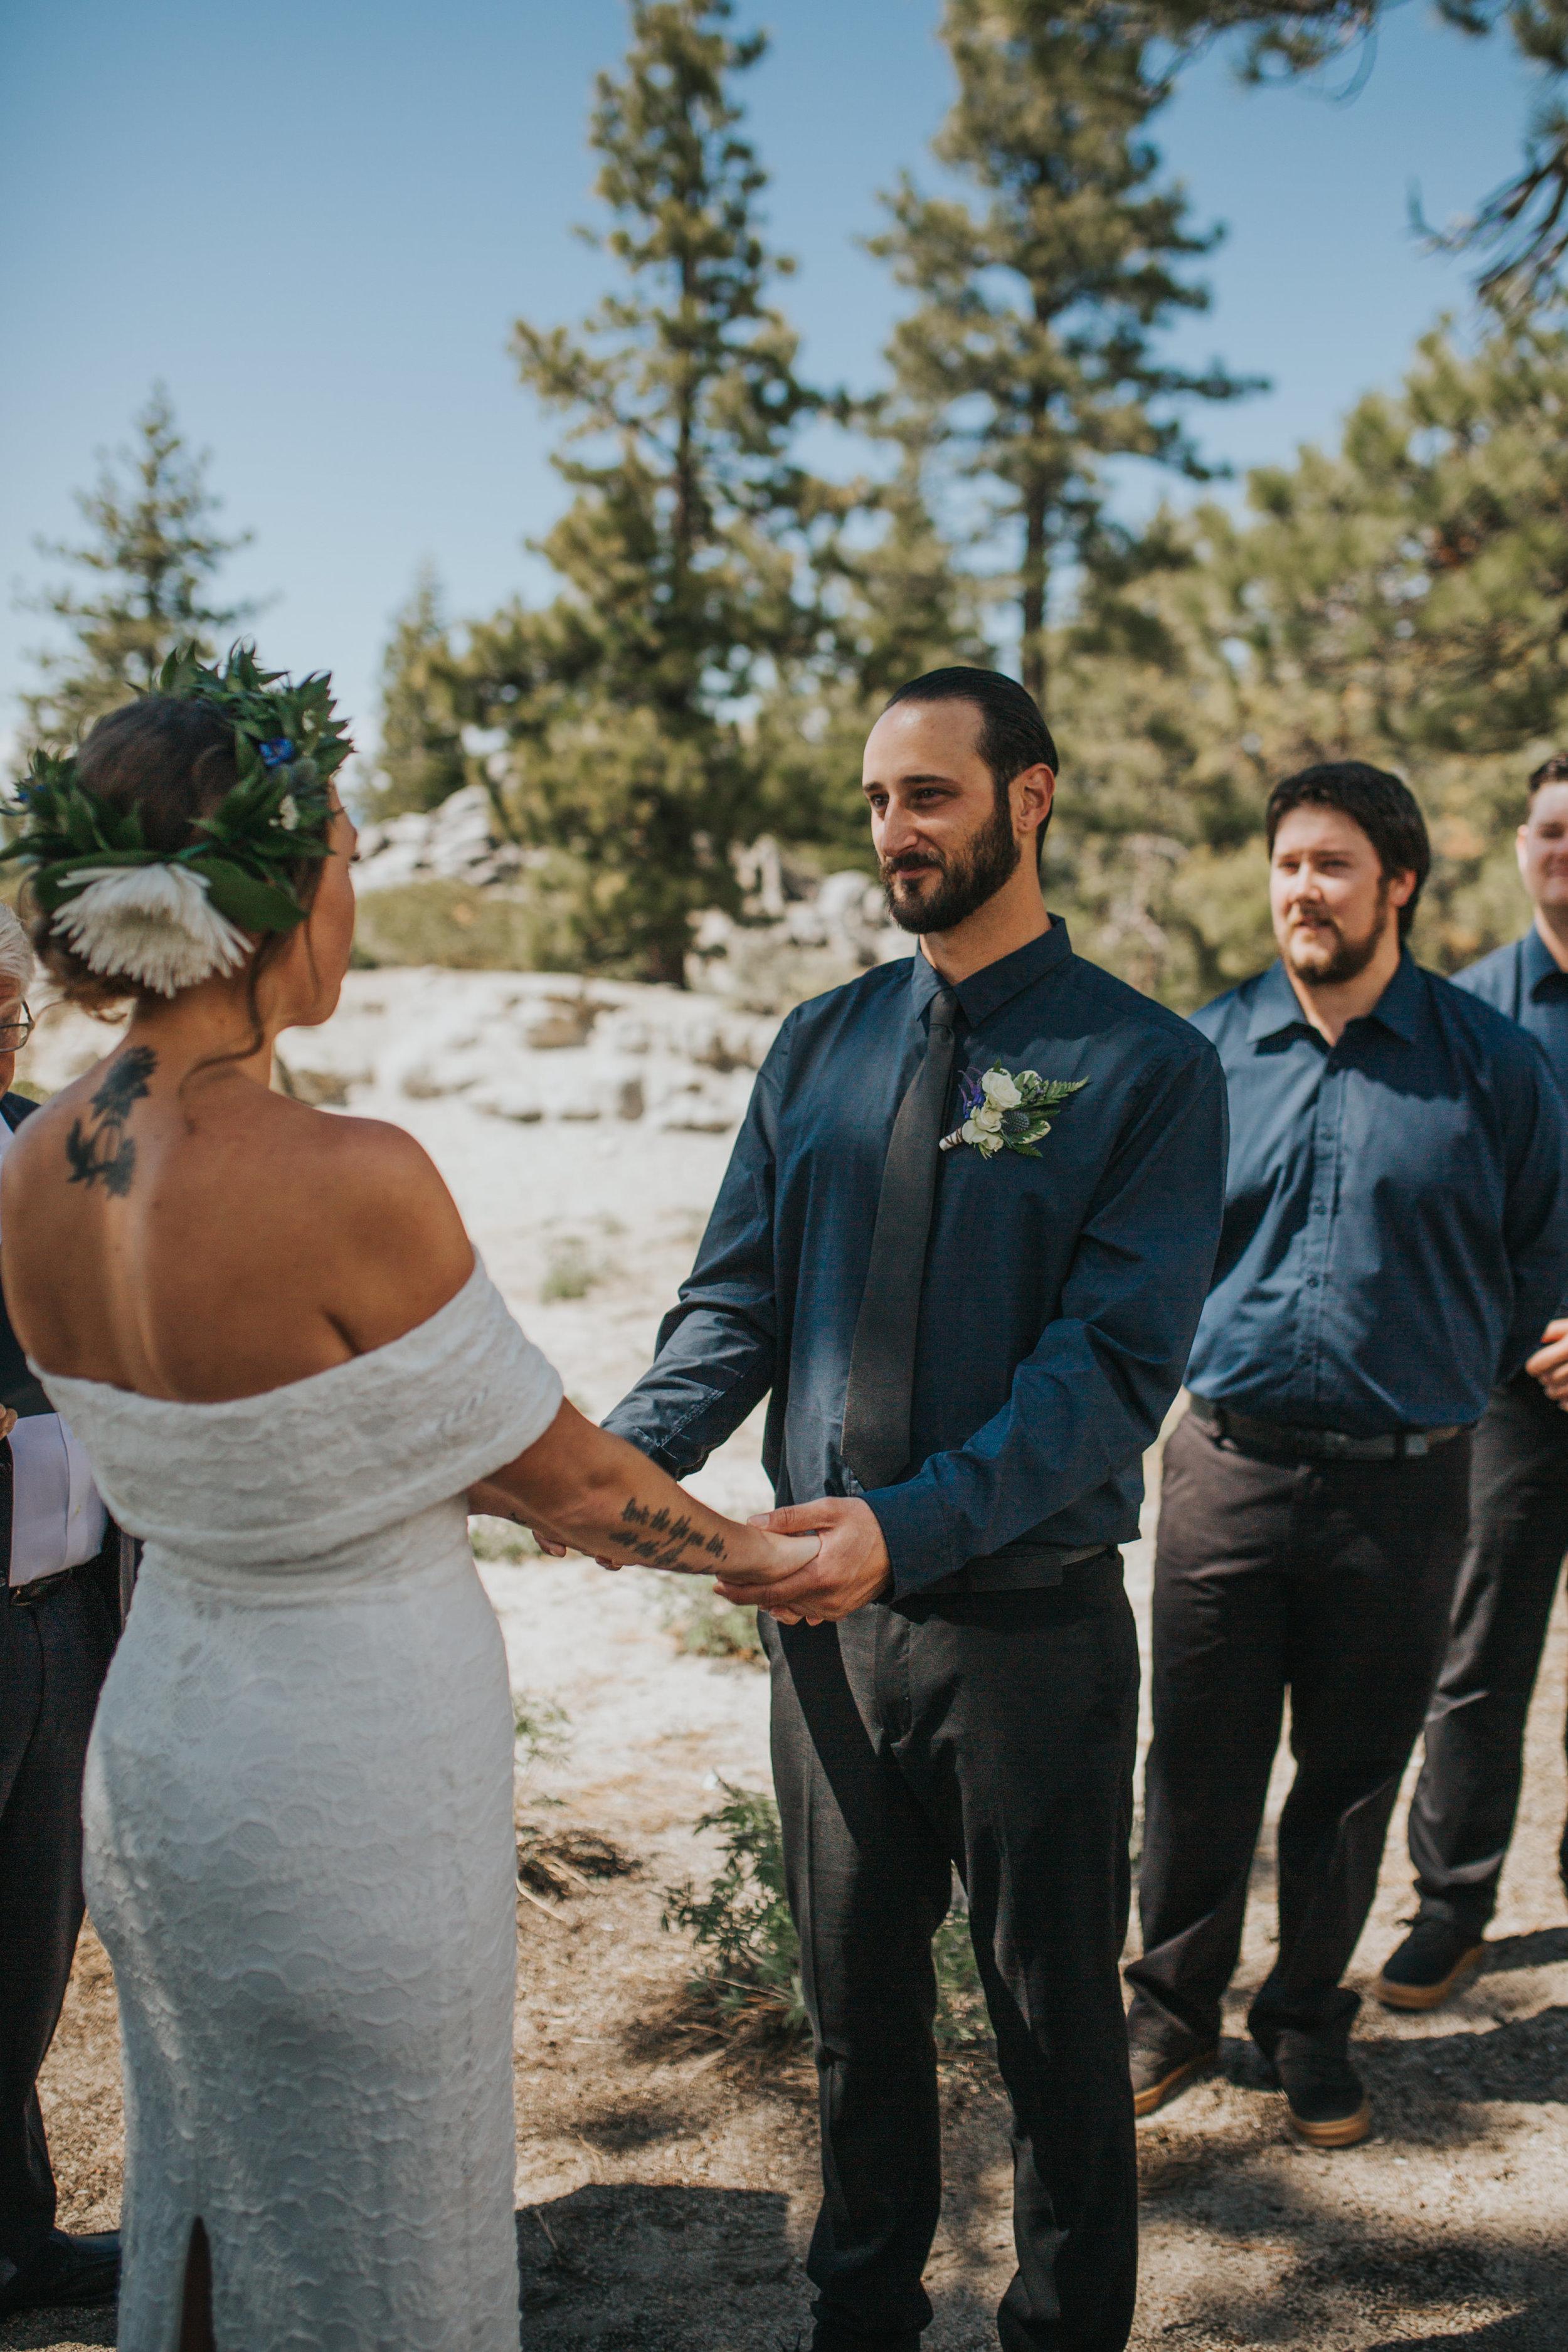 south-lake-tahoe-elopement-valerie-lendvay-photo-029.jpg